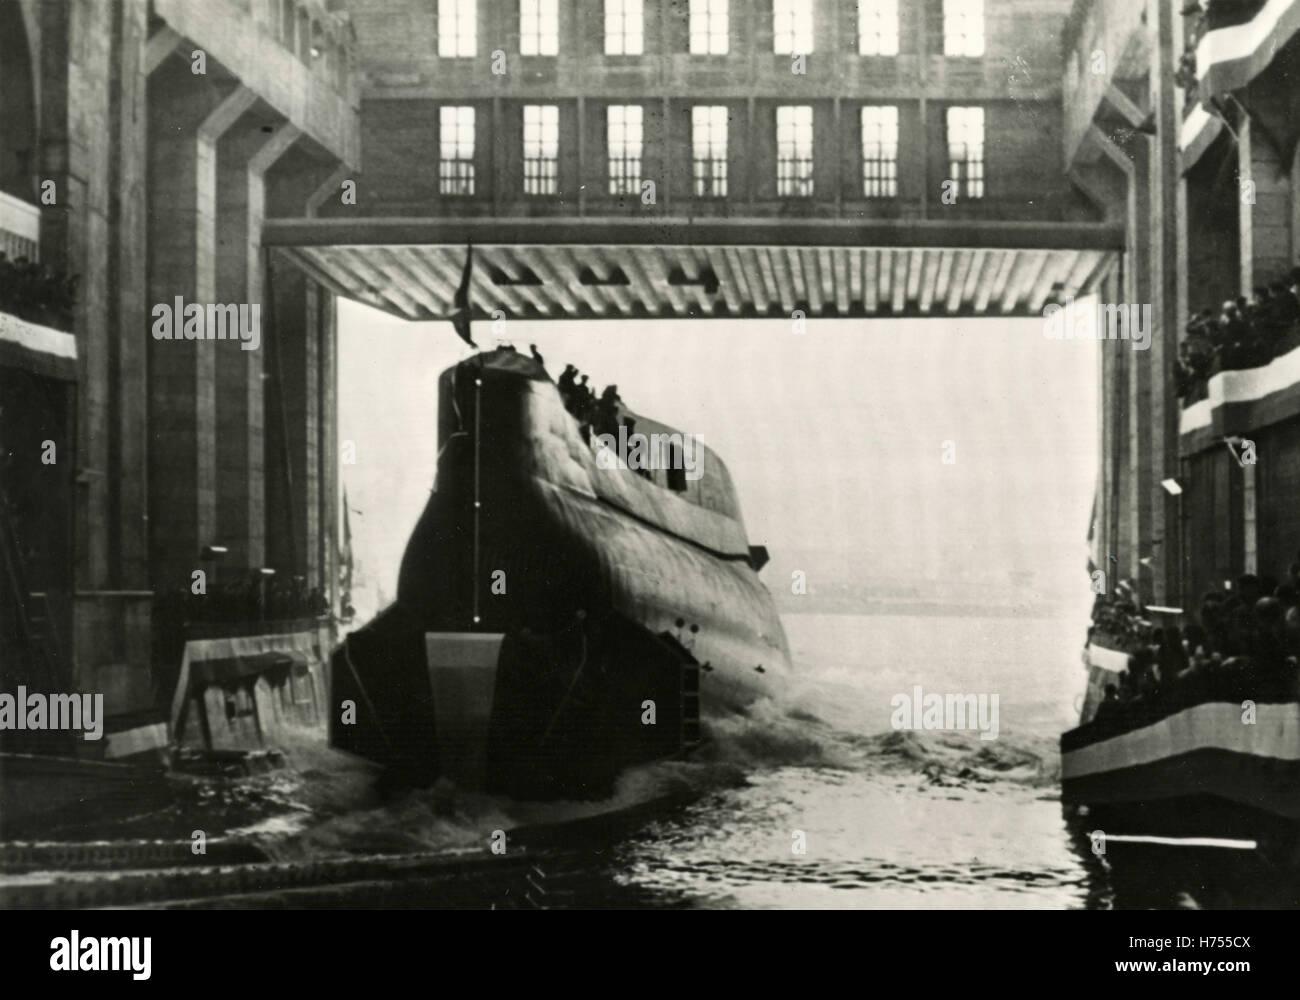 Submarine is within the range, USA - Stock Image